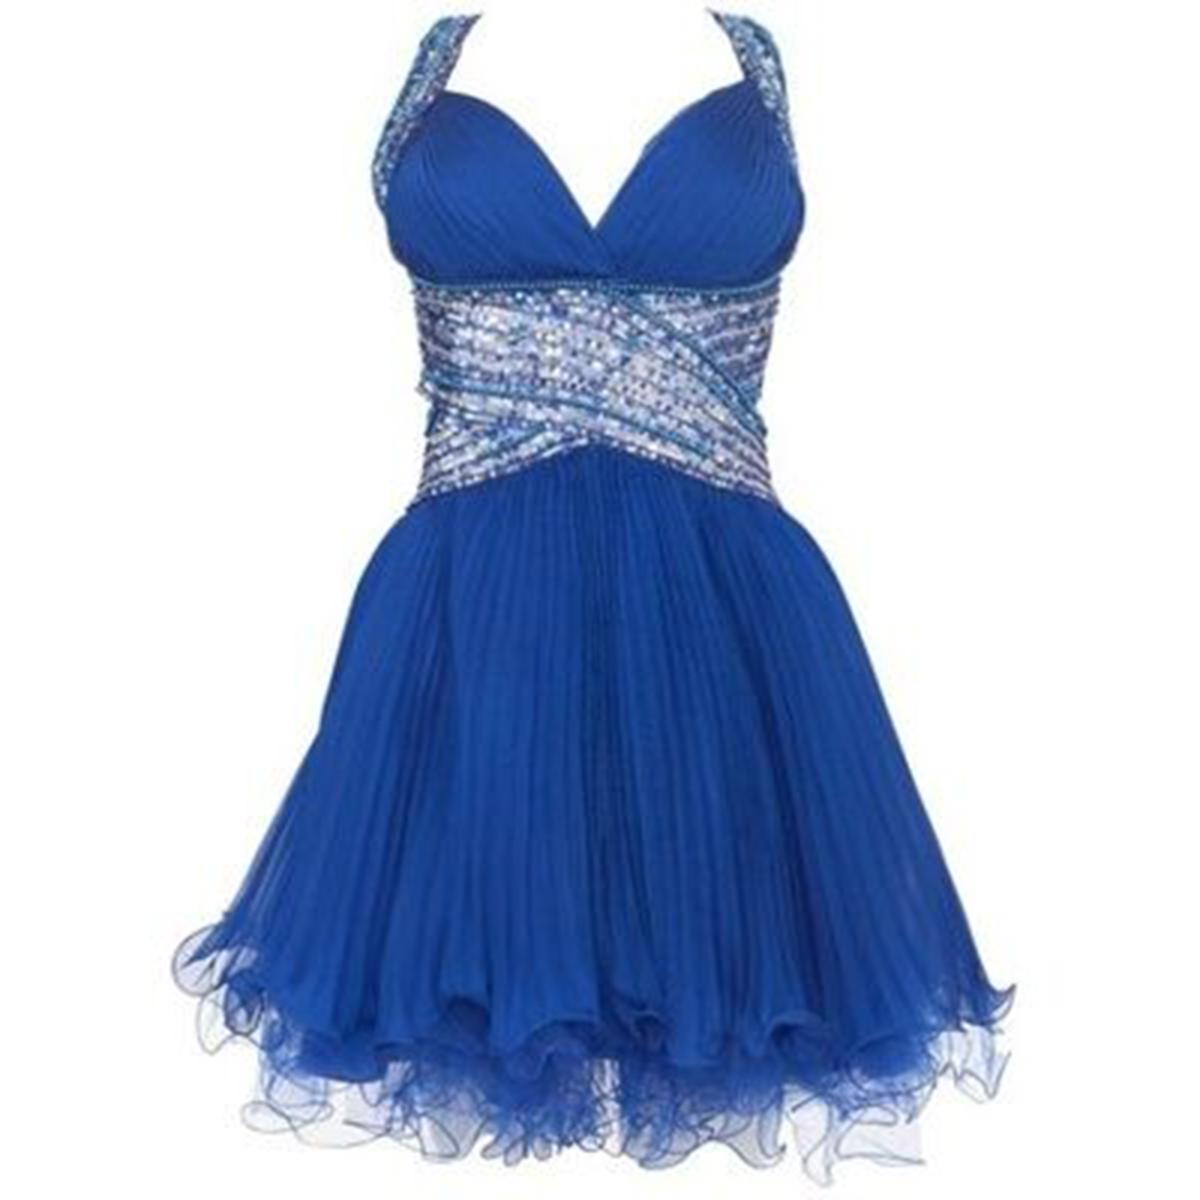 Cute cross back blue chiffon short prom dress